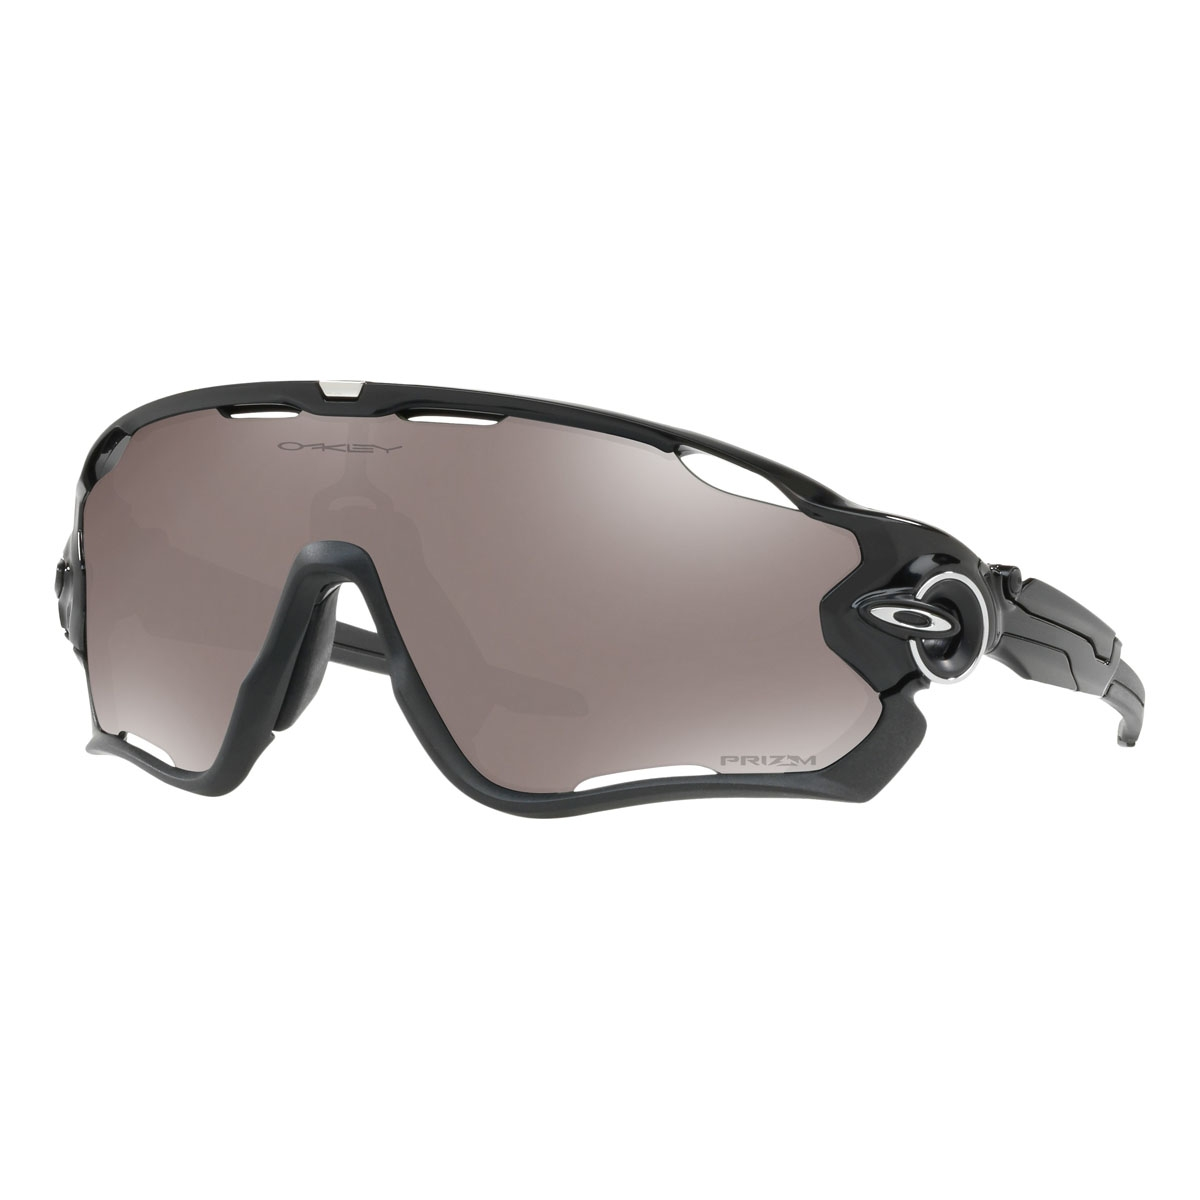 db2fd2900ae Image of Oakley Jawbreaker Prizm Polarised Sunglasses - Polished Black  Frame Prizm Black Polarized Lens